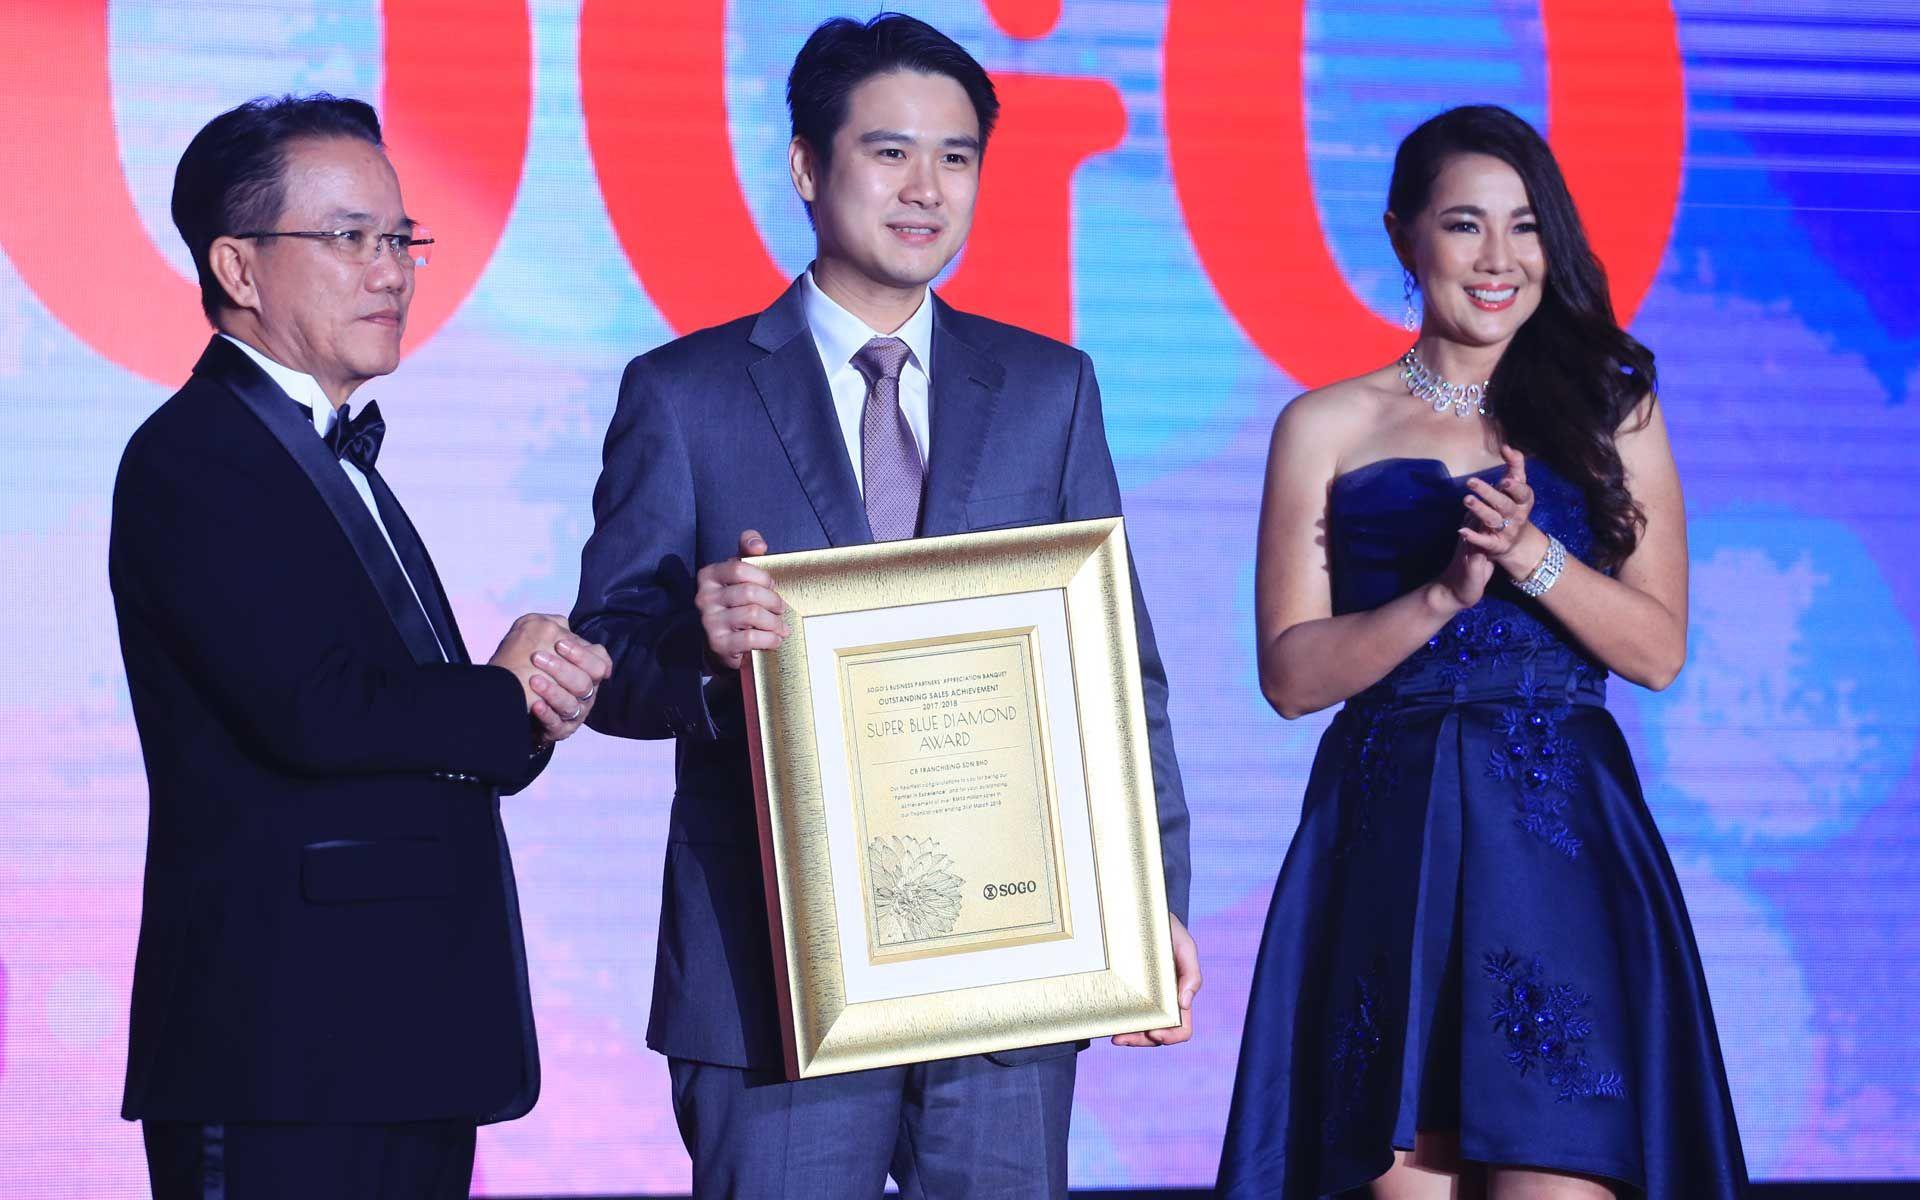 Dato' Sri Daniel Chiang receiving the Super Blue Diamond Award for Bonia - the highest sales achiever of the night